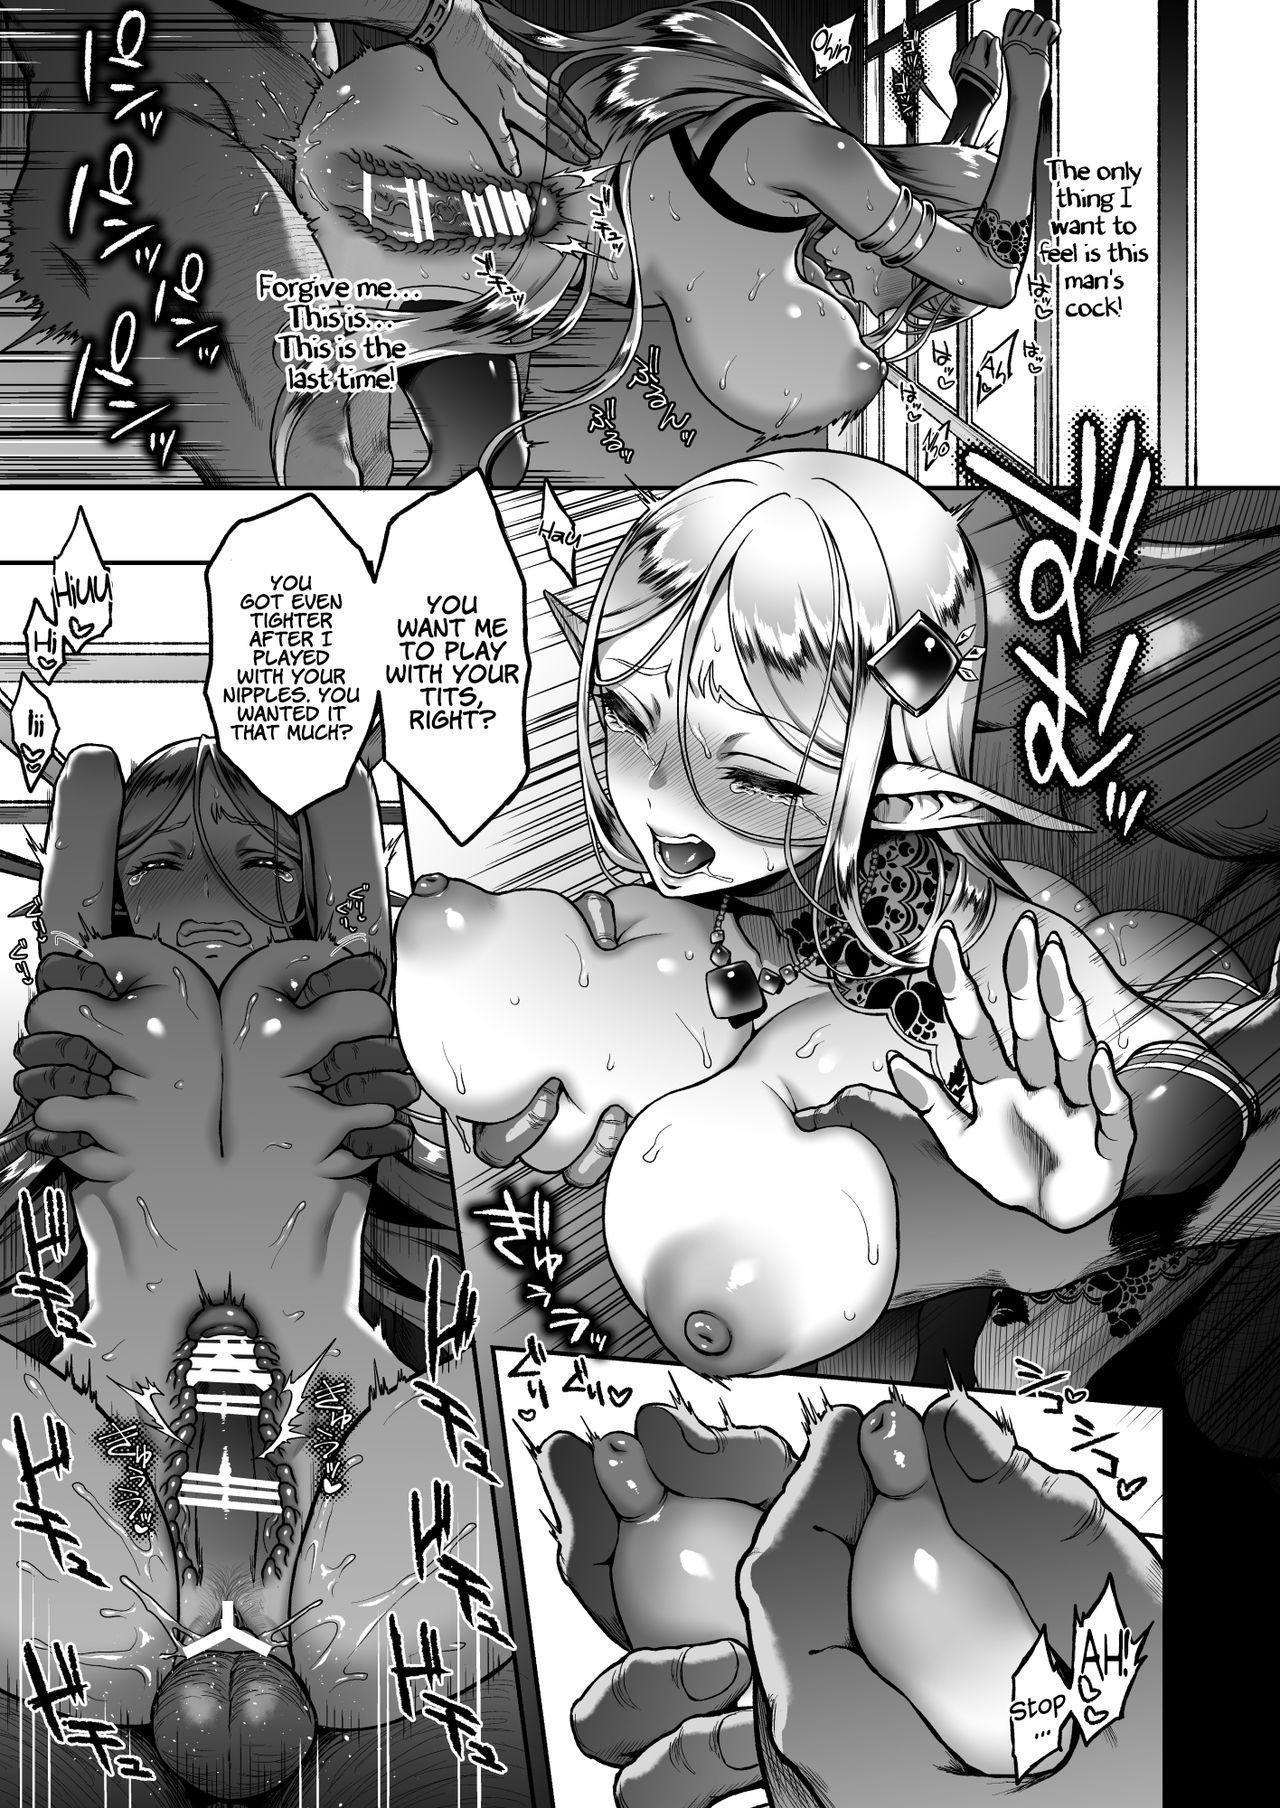 Tasogare no Shou Elf 5 | The Melancholy of the Prostitute Elf 5 29